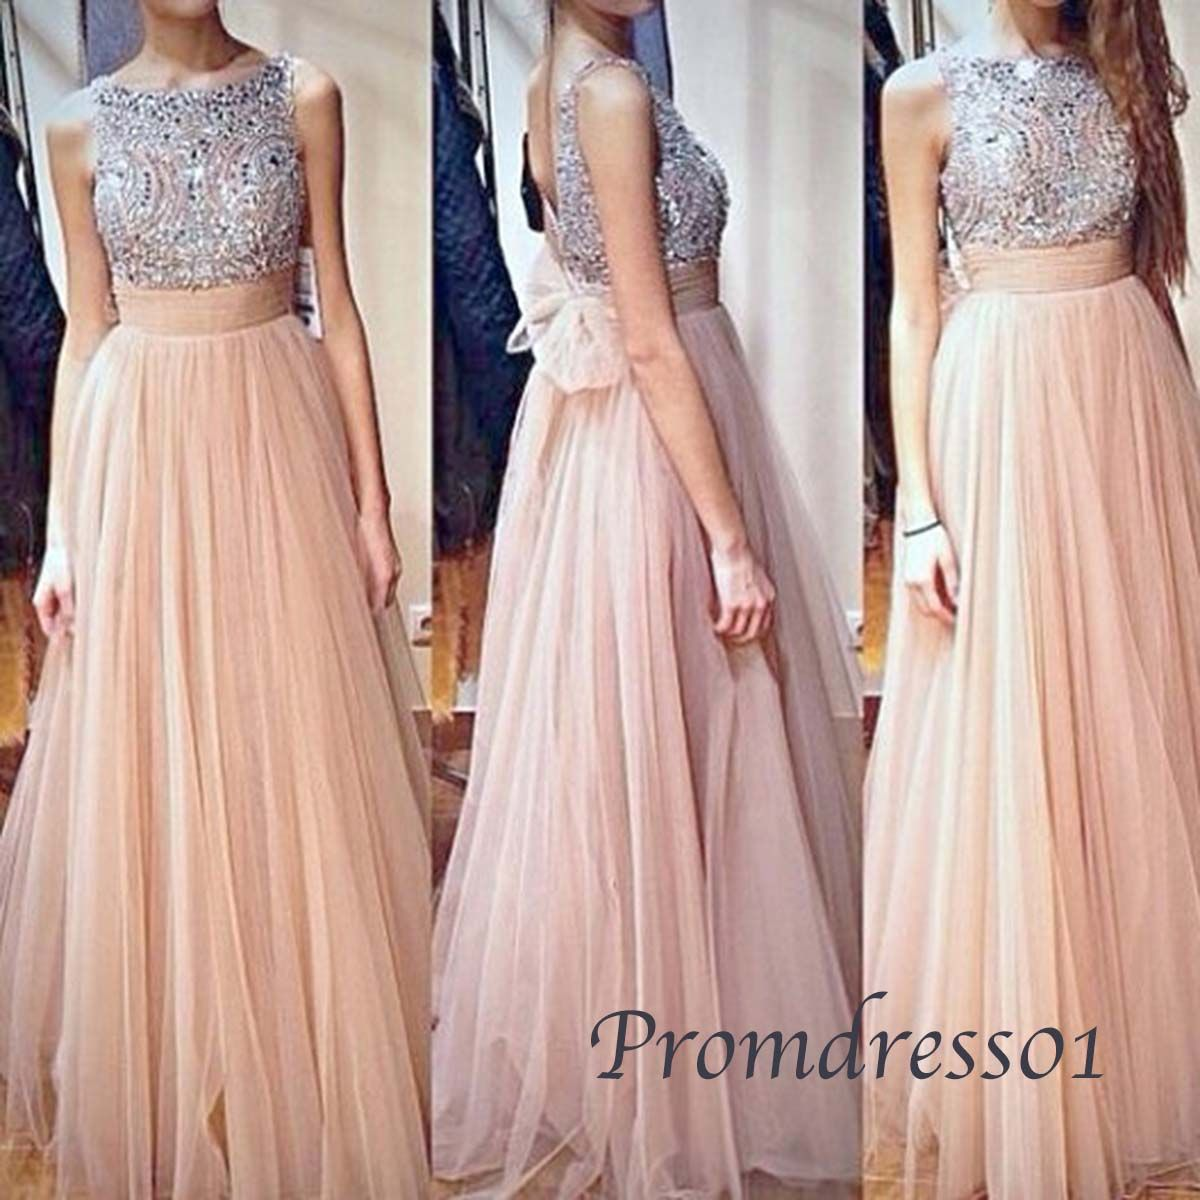 elegant round neck sequins vintage chiffon long prom dress with